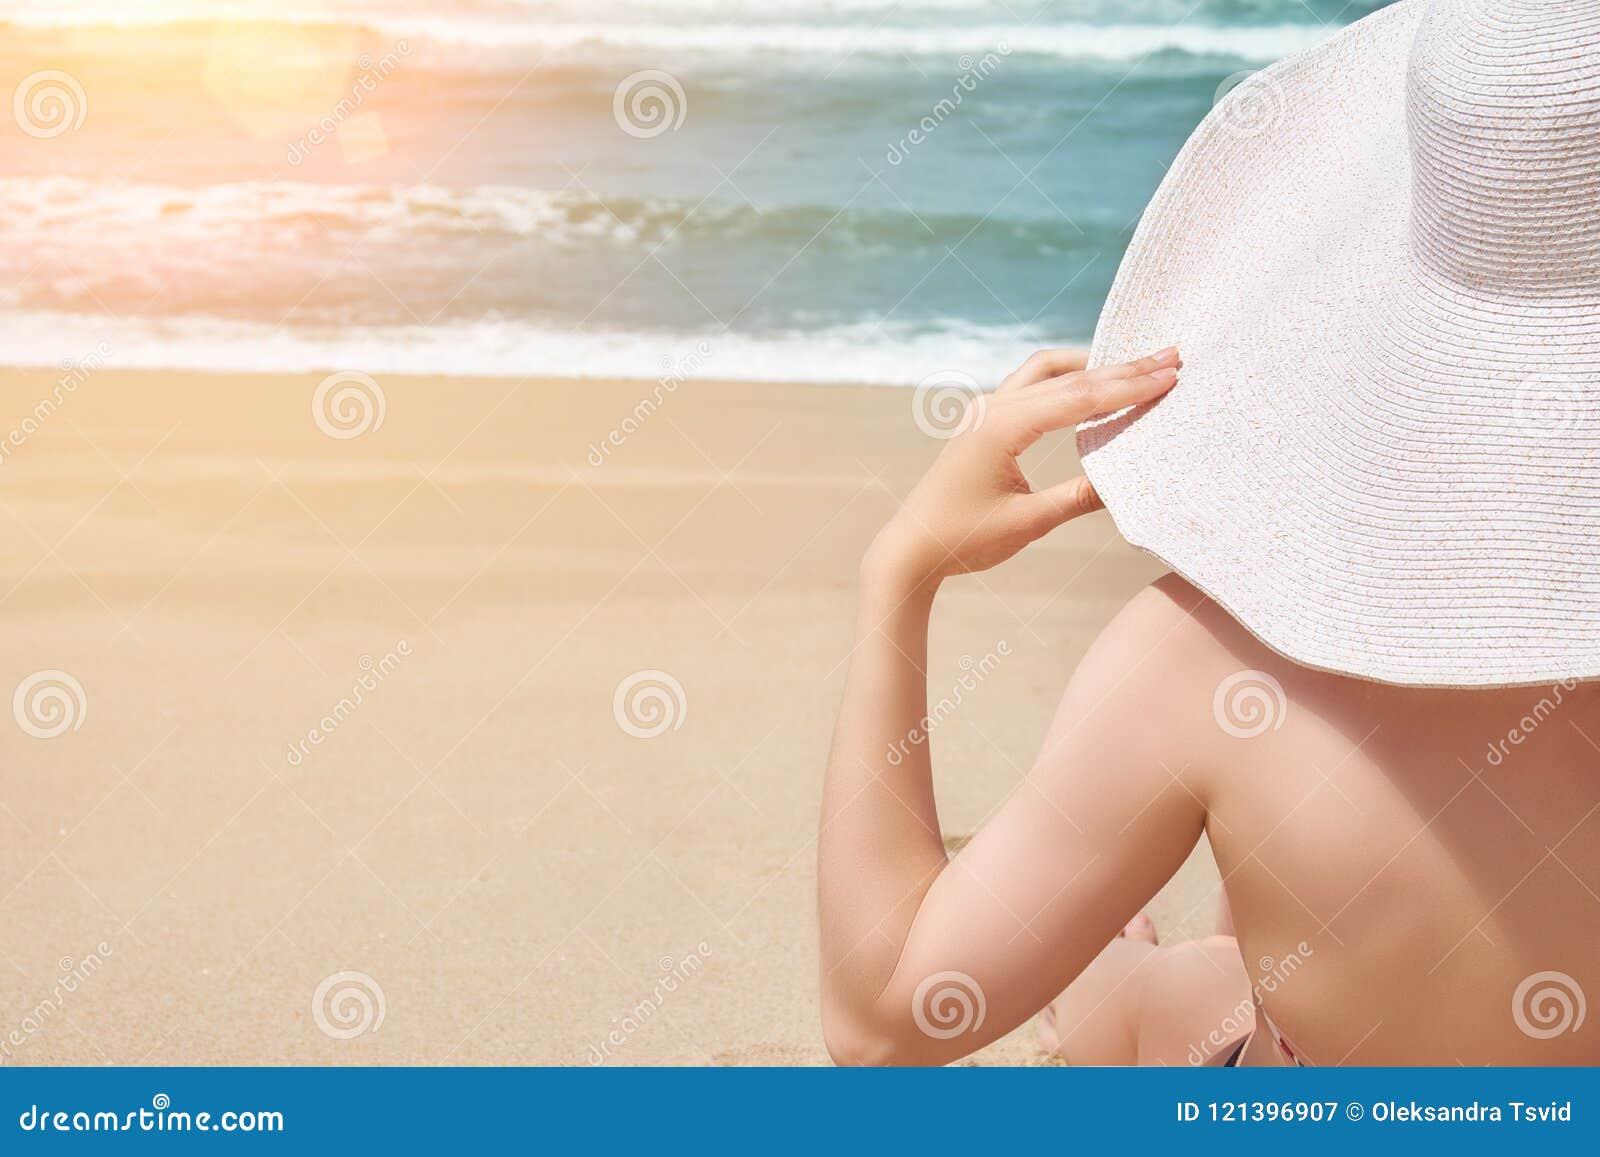 Summer beach concept. Woman in big hat on idyllic beach. Ocean beach relax, travel.